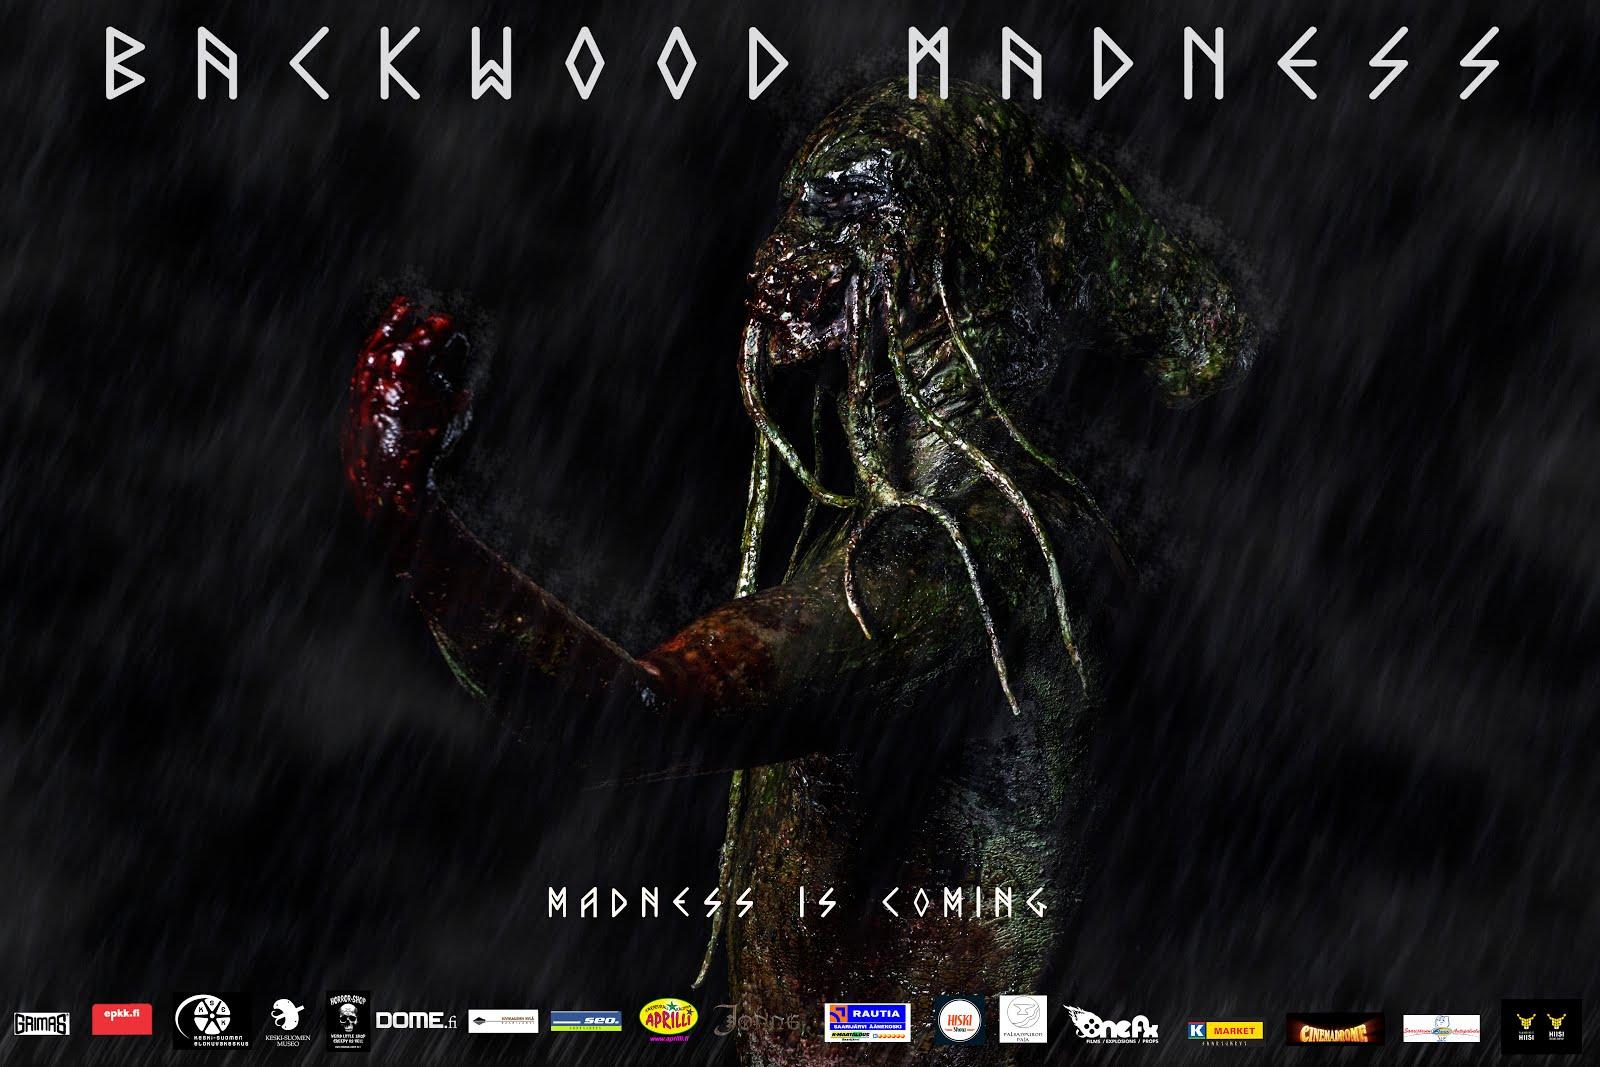 NÄKKI. Backwood Madness. Hirviöelokuva.